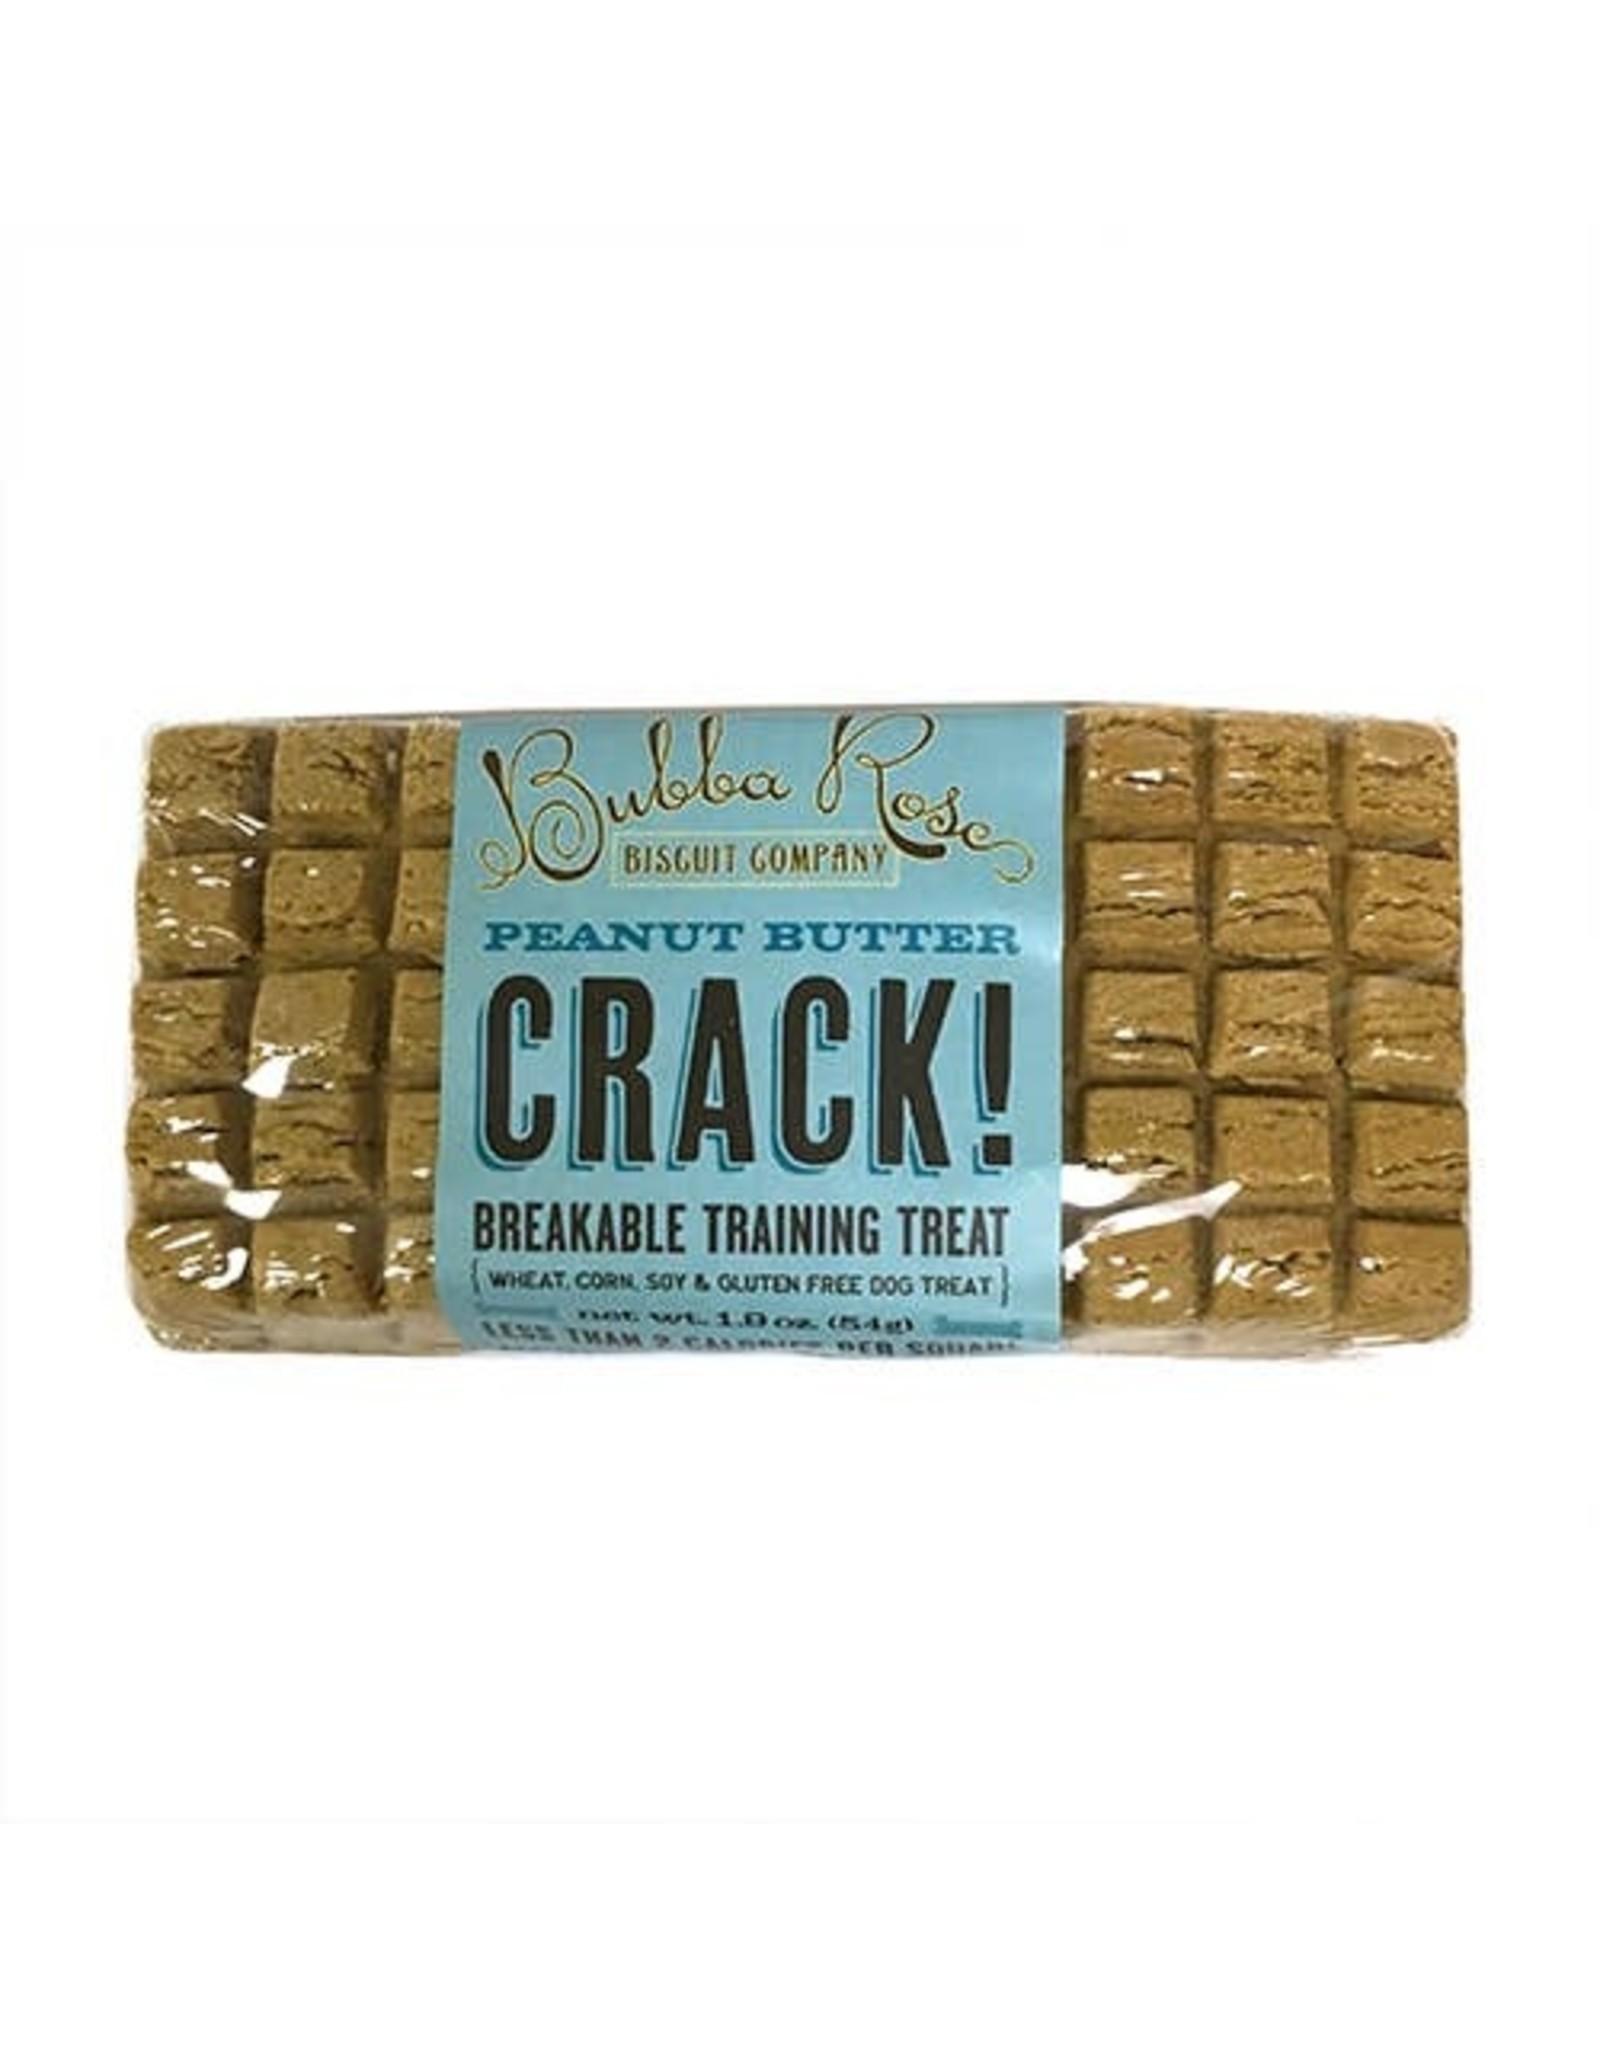 Crack! Bars Peanut Butter